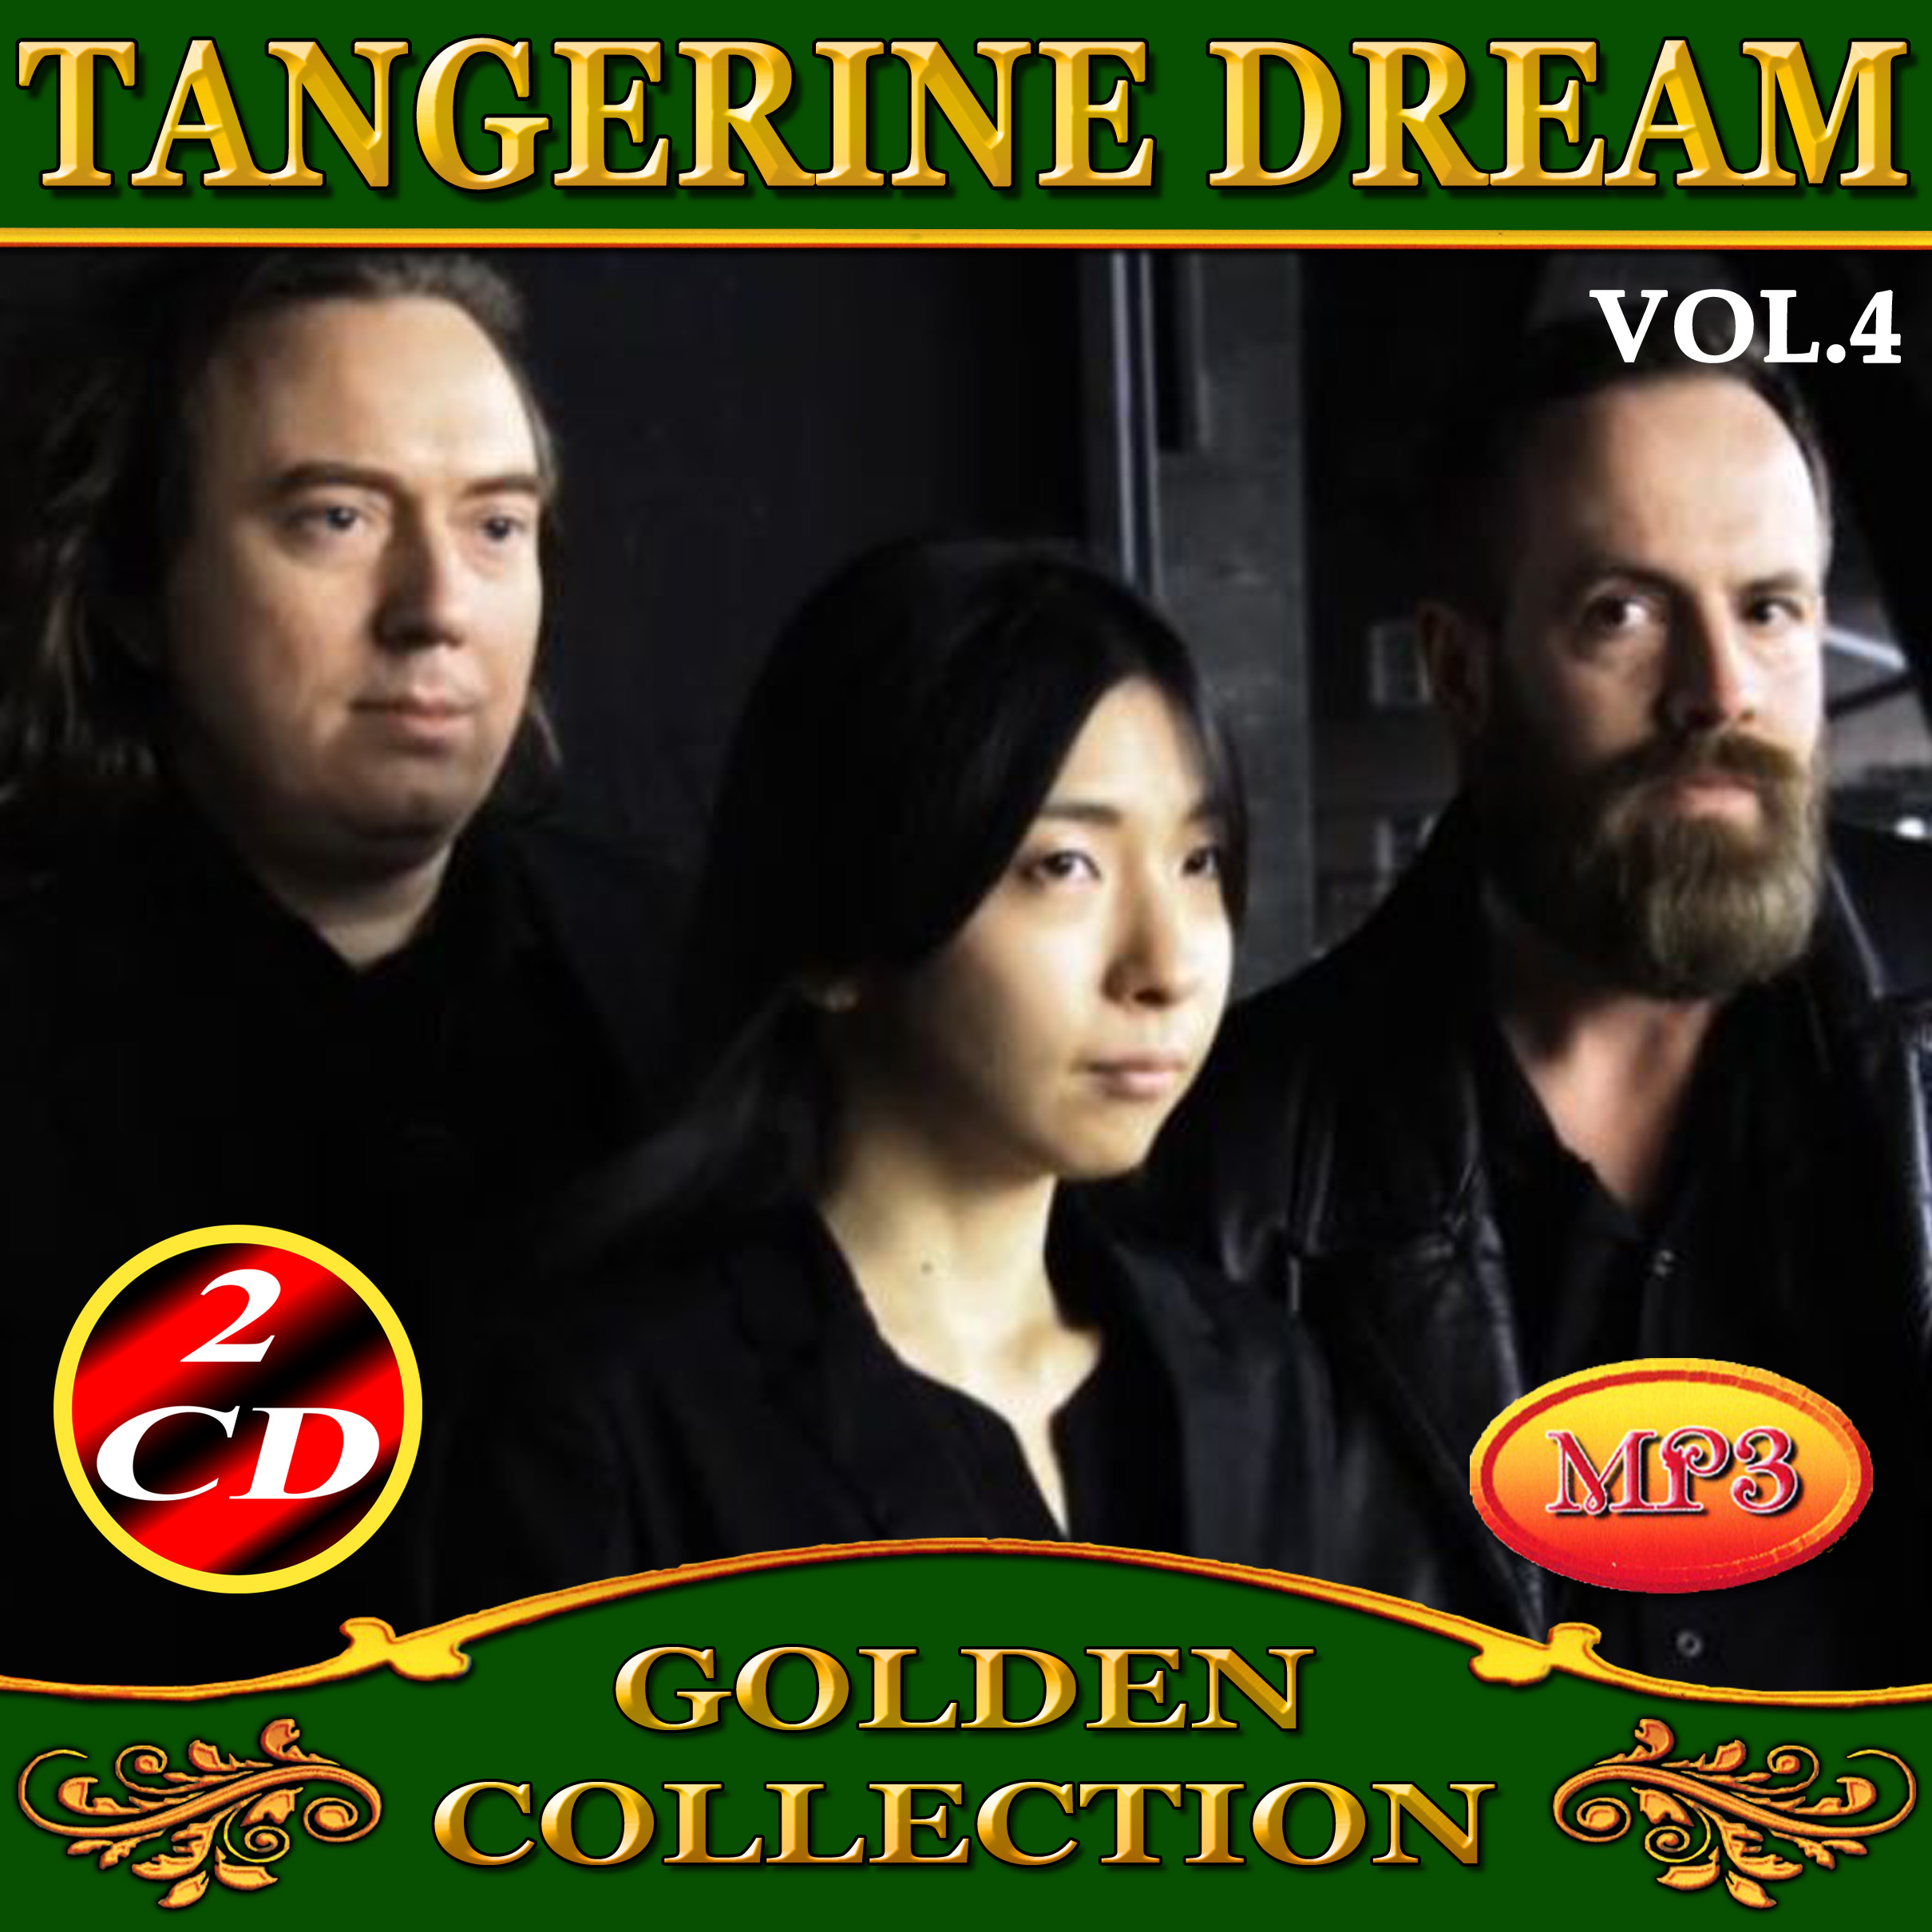 Tangerine Dream 4ч2cd [mp3]